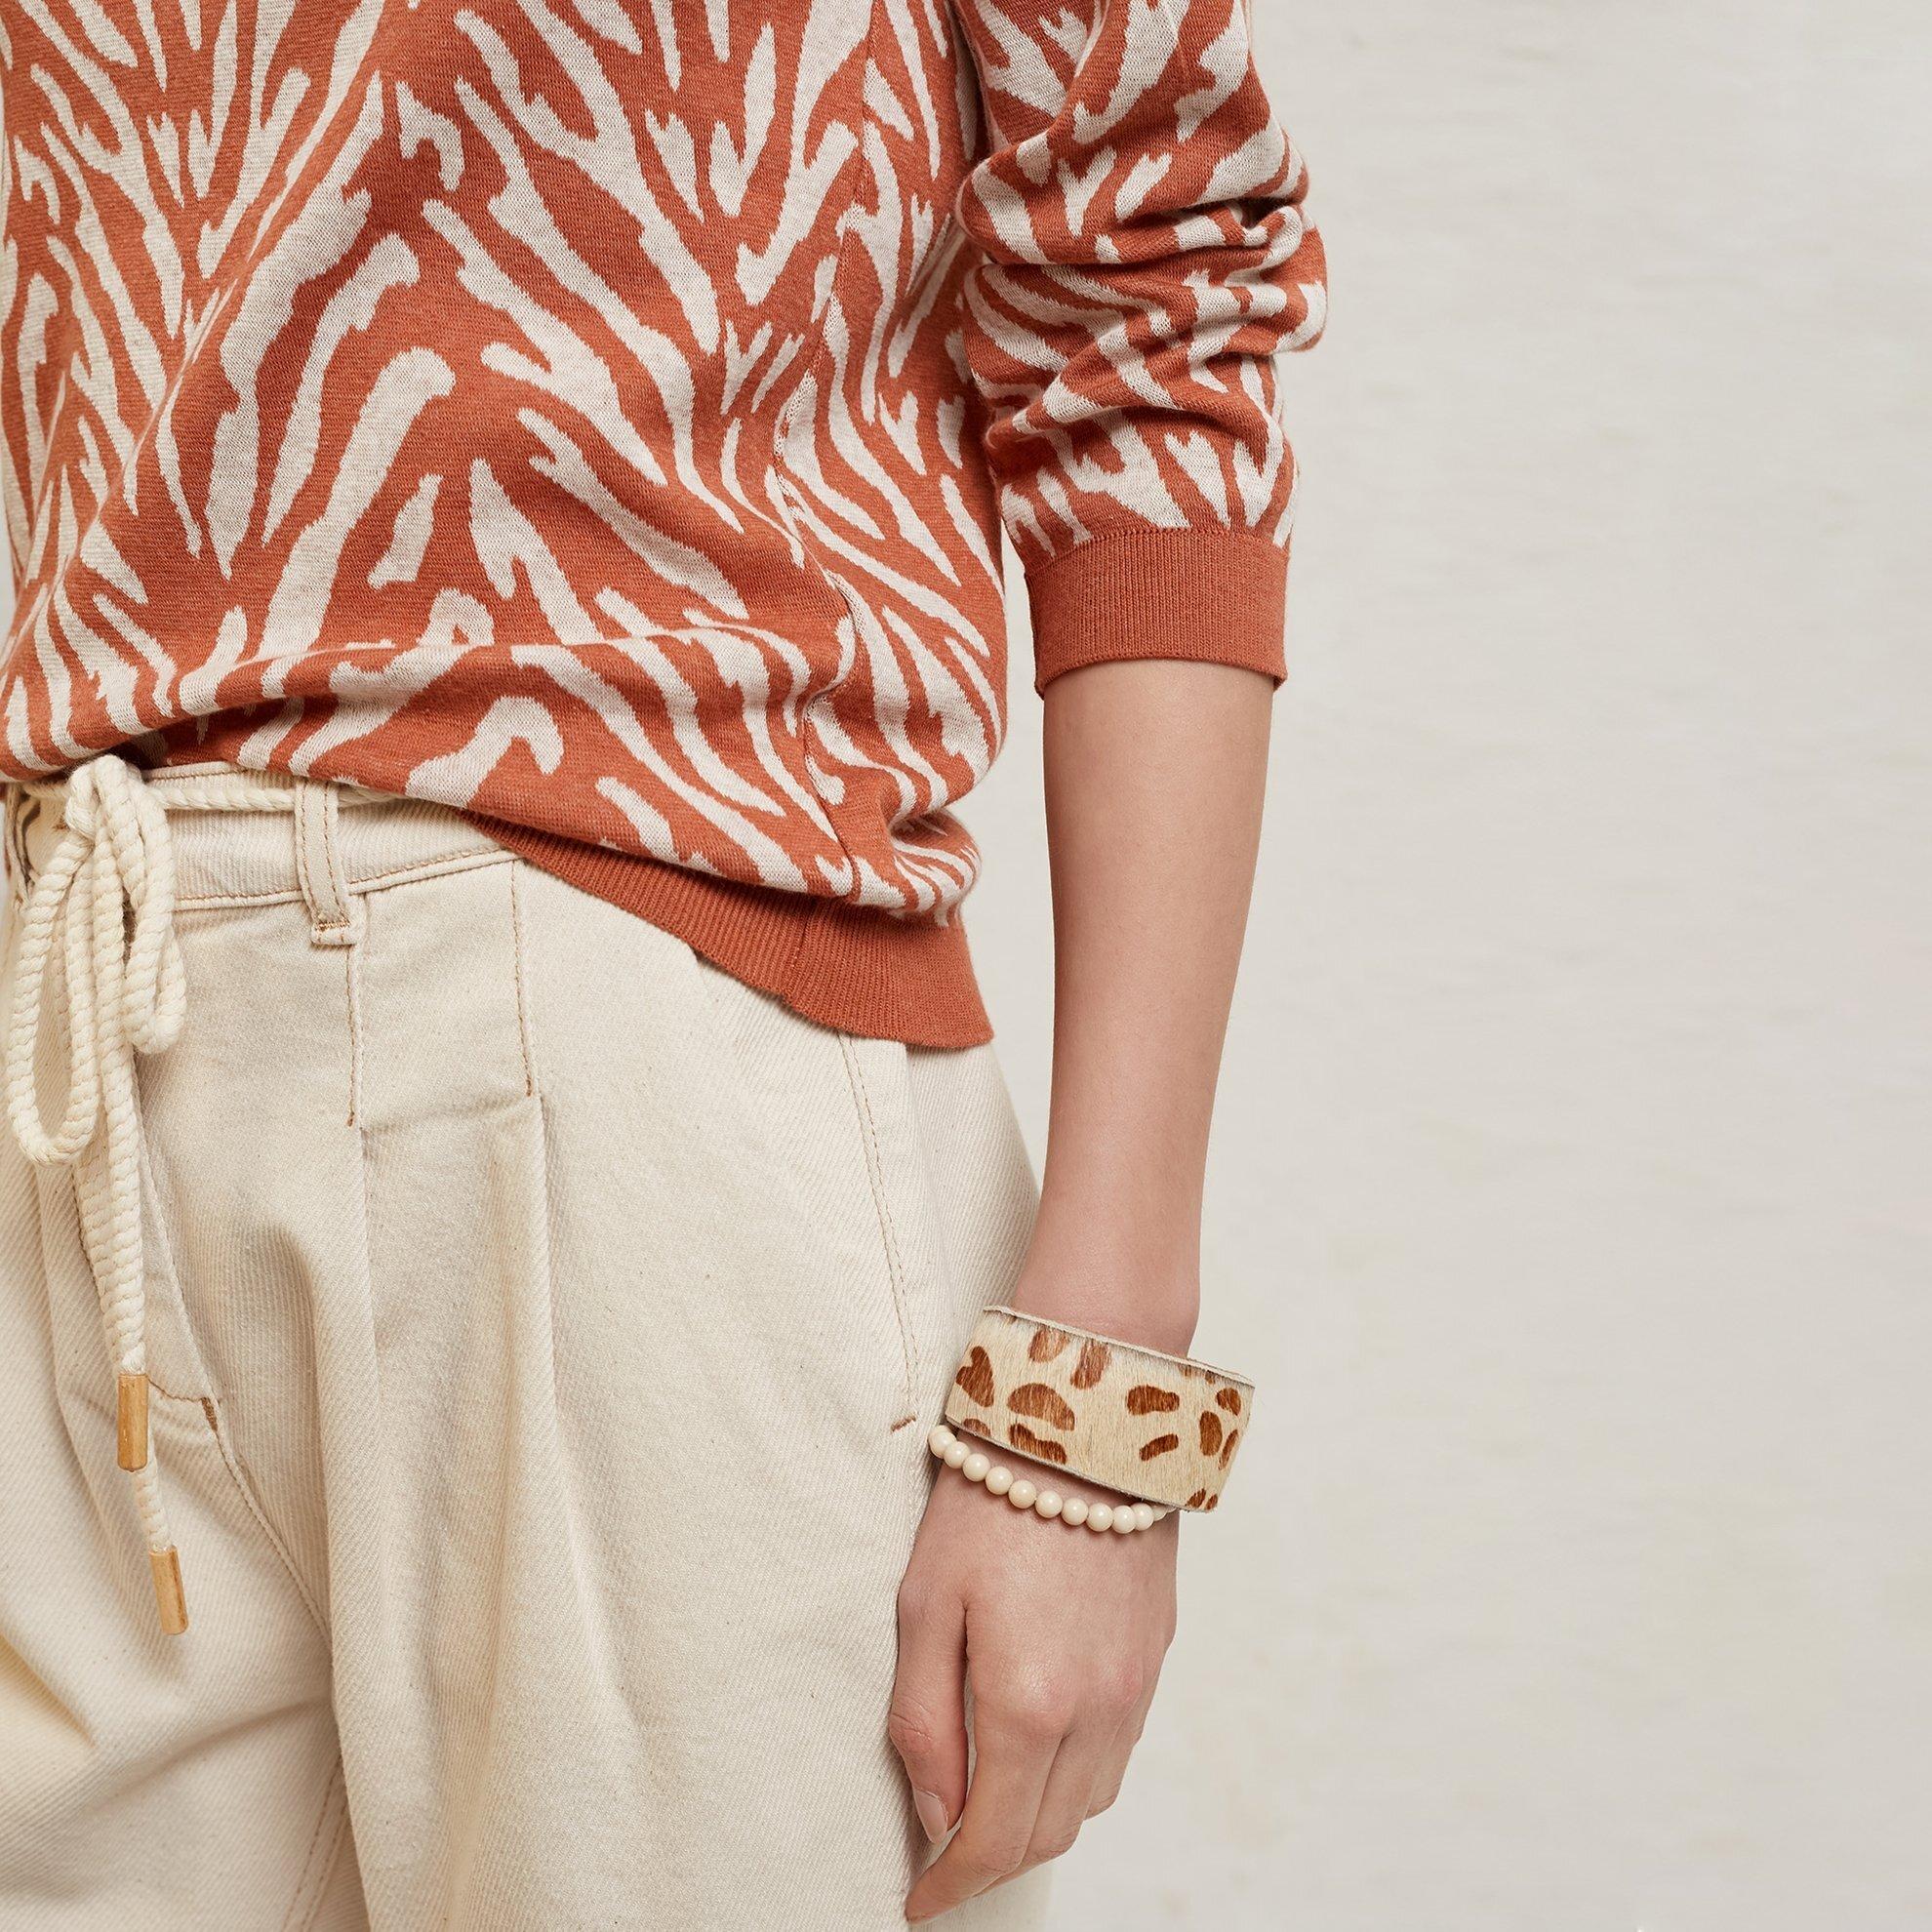 Jacquard Pattern Knitwear